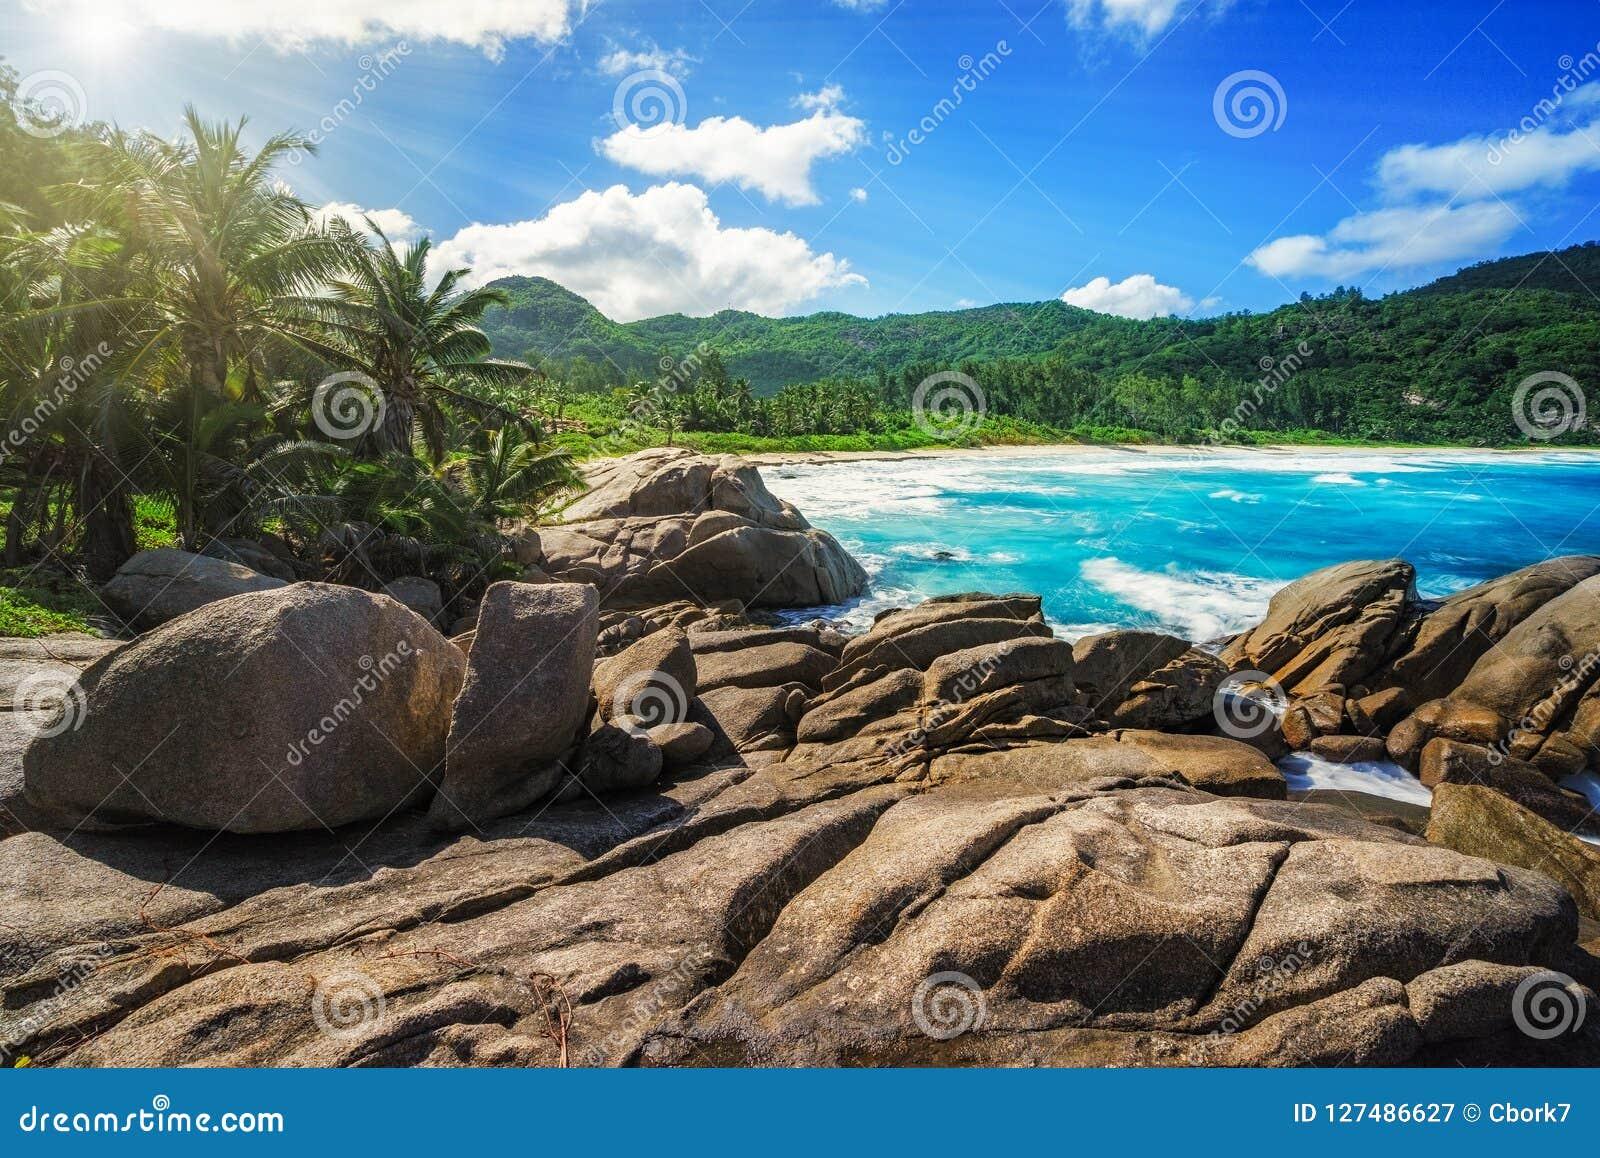 Granietrotsen, palmen, wild paradijs tropisch strand, sey politiebaai,